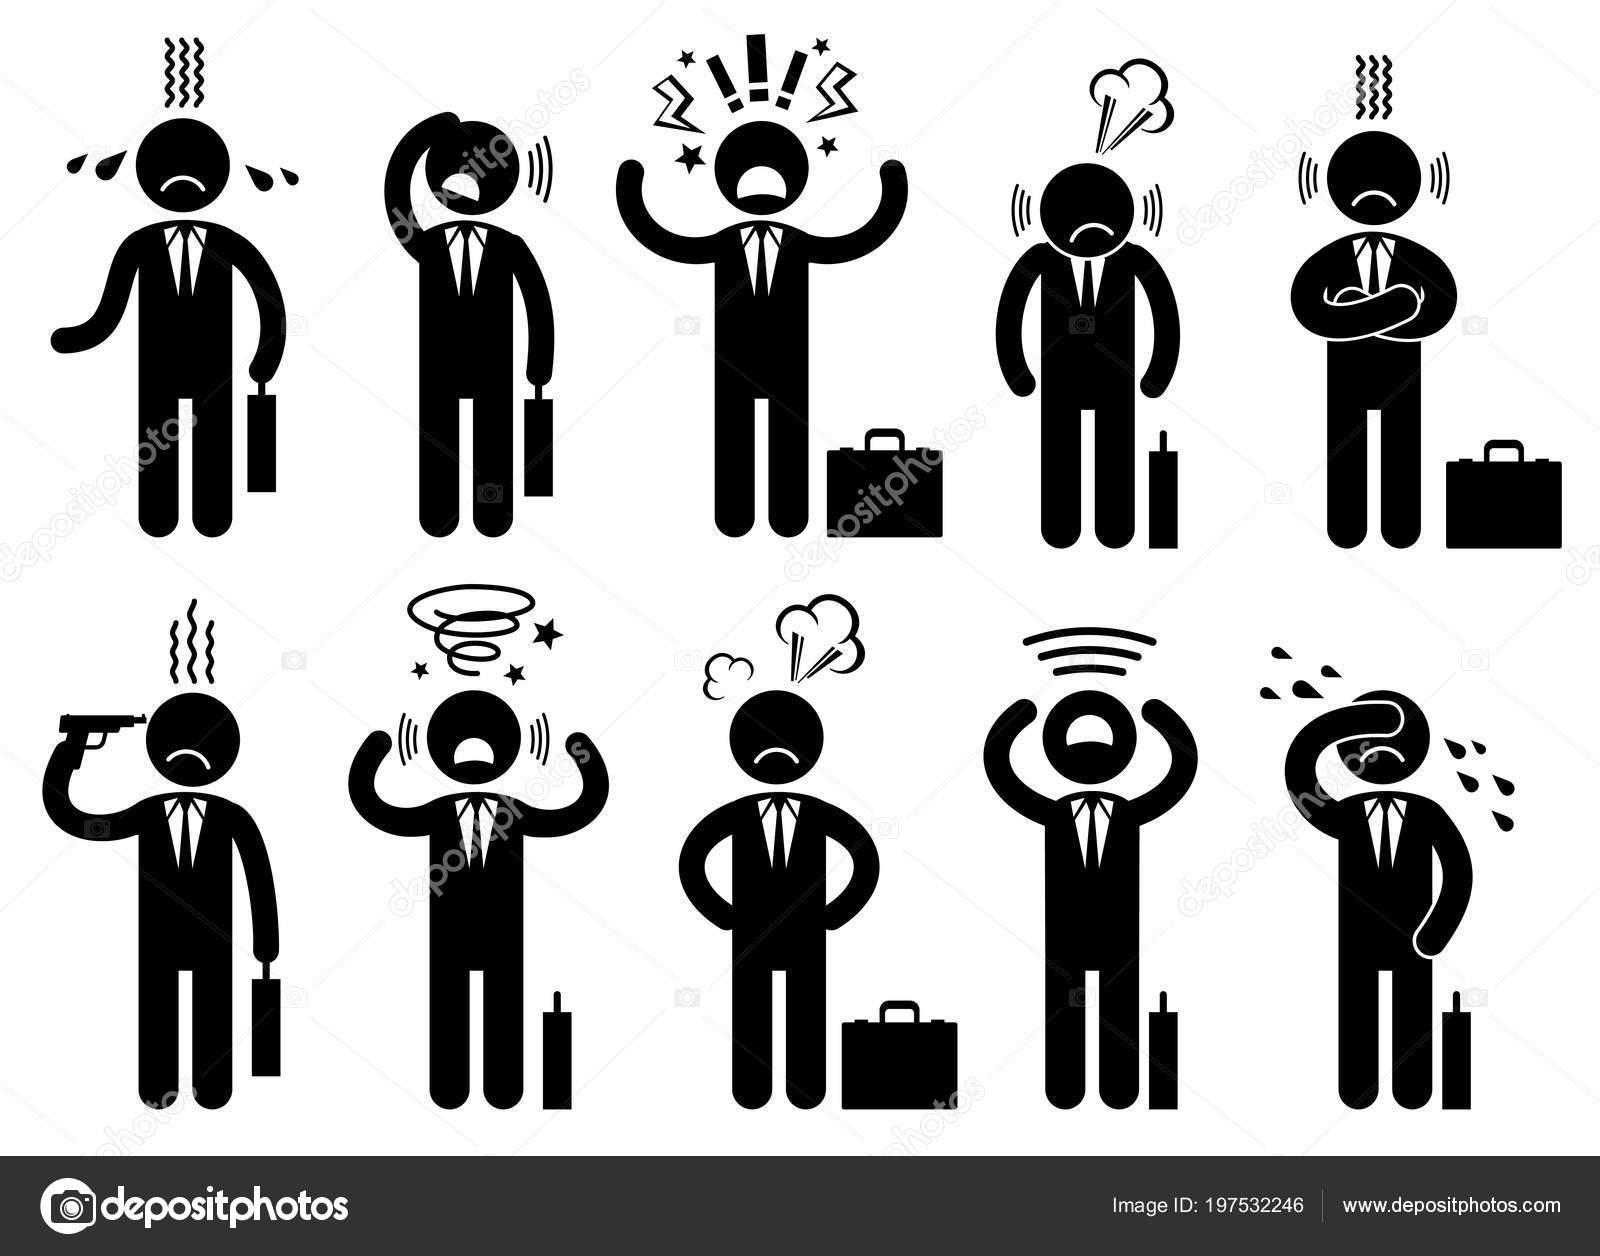 Businessman Stress Pressure Business Mental Issues